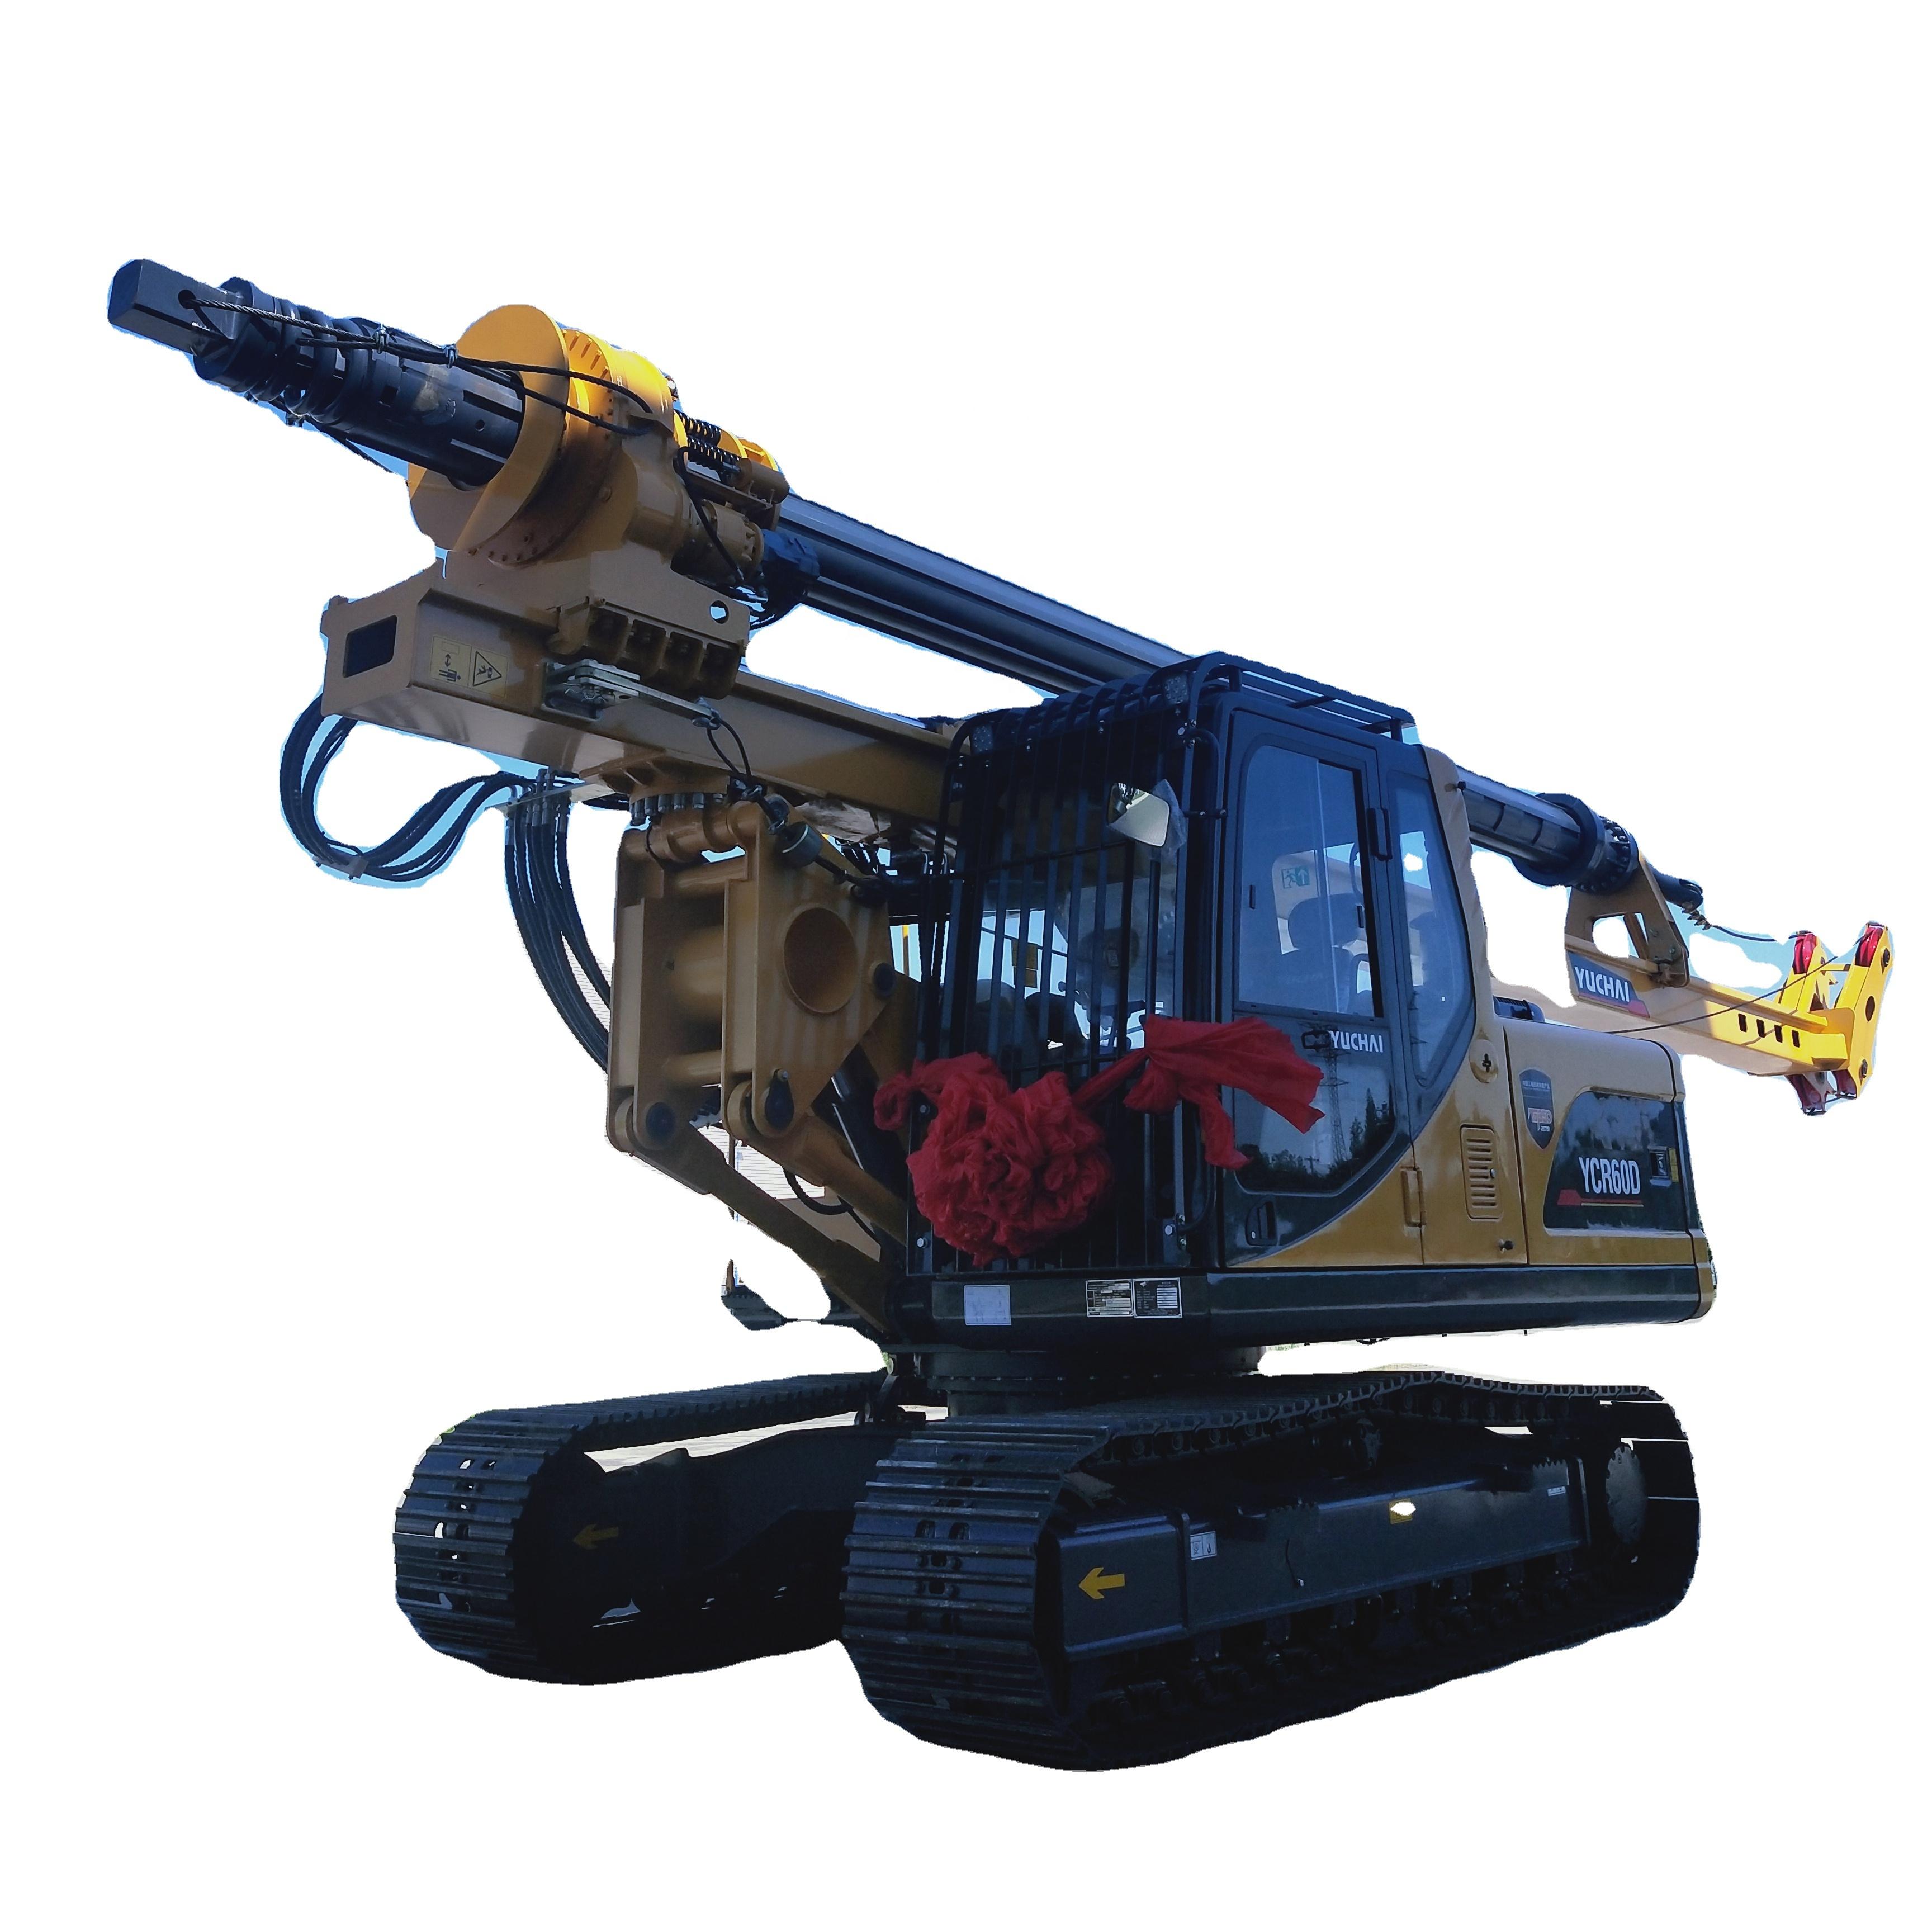 YUCHAI Mini Crawler Rotary Drilling Rig portable rotary drilling machine YCR60